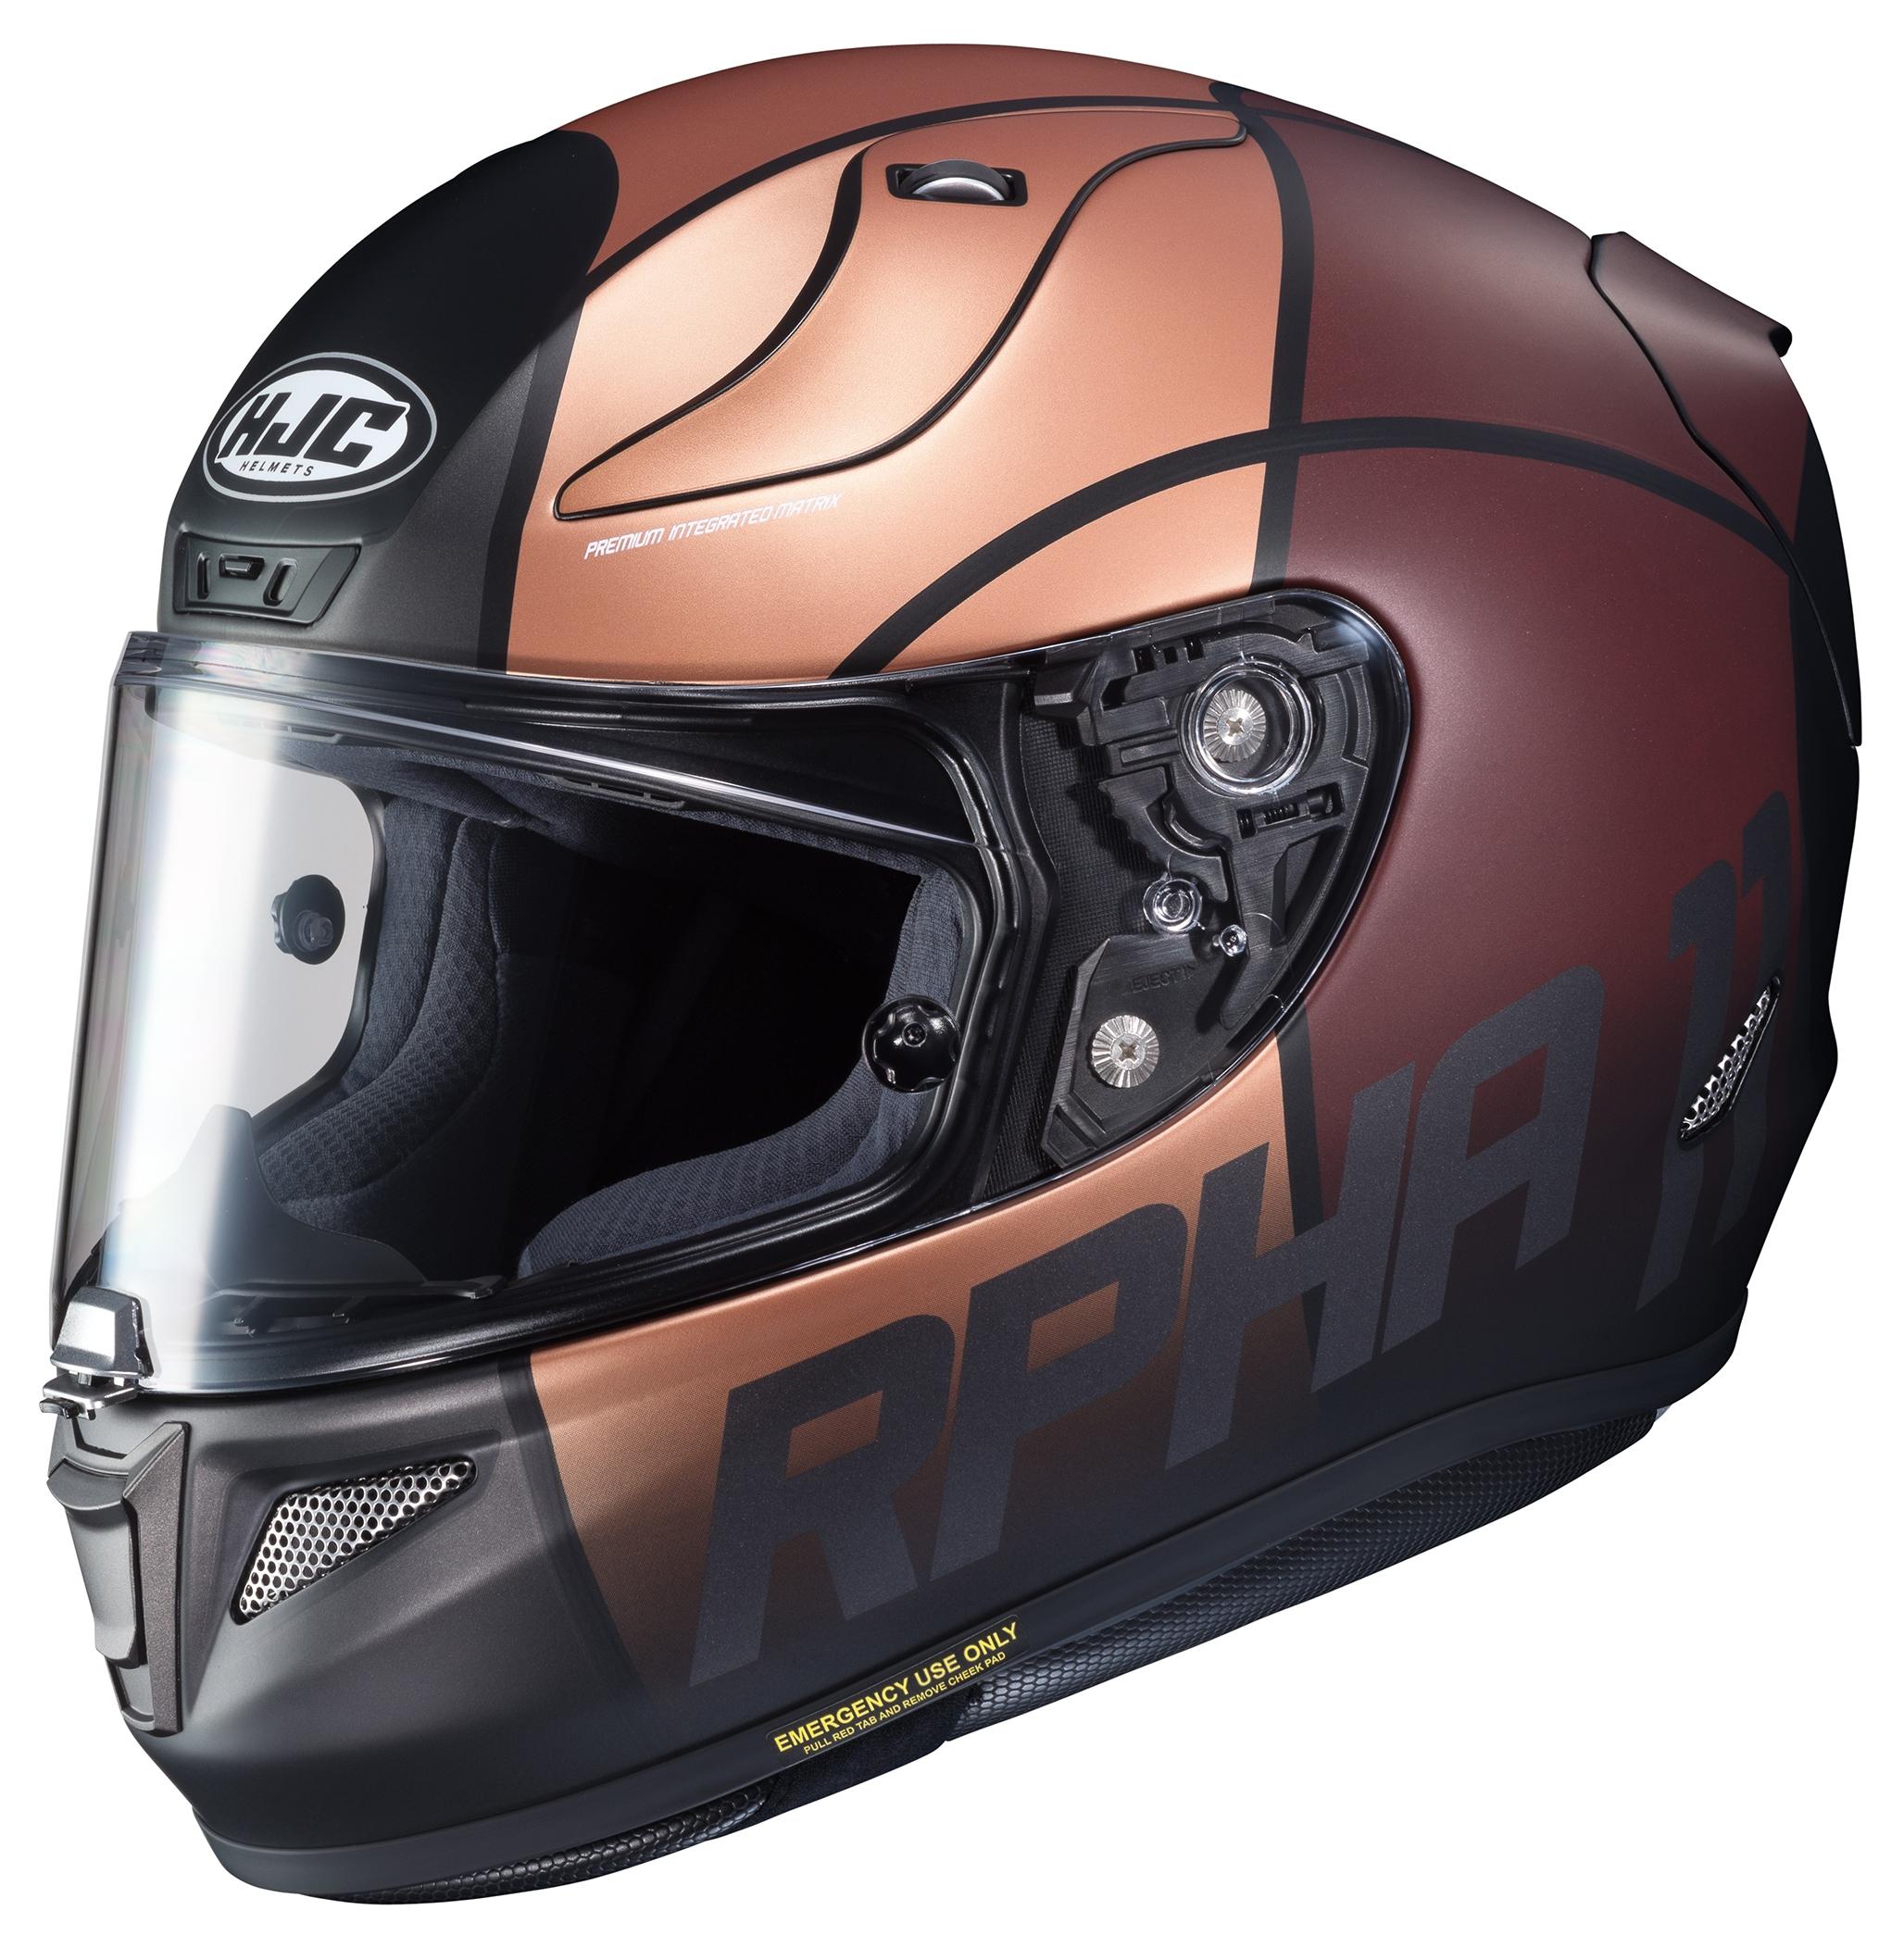 5518f3b0 HJC RPHA 11 Pro Quintain Helmet - Cycle Gear